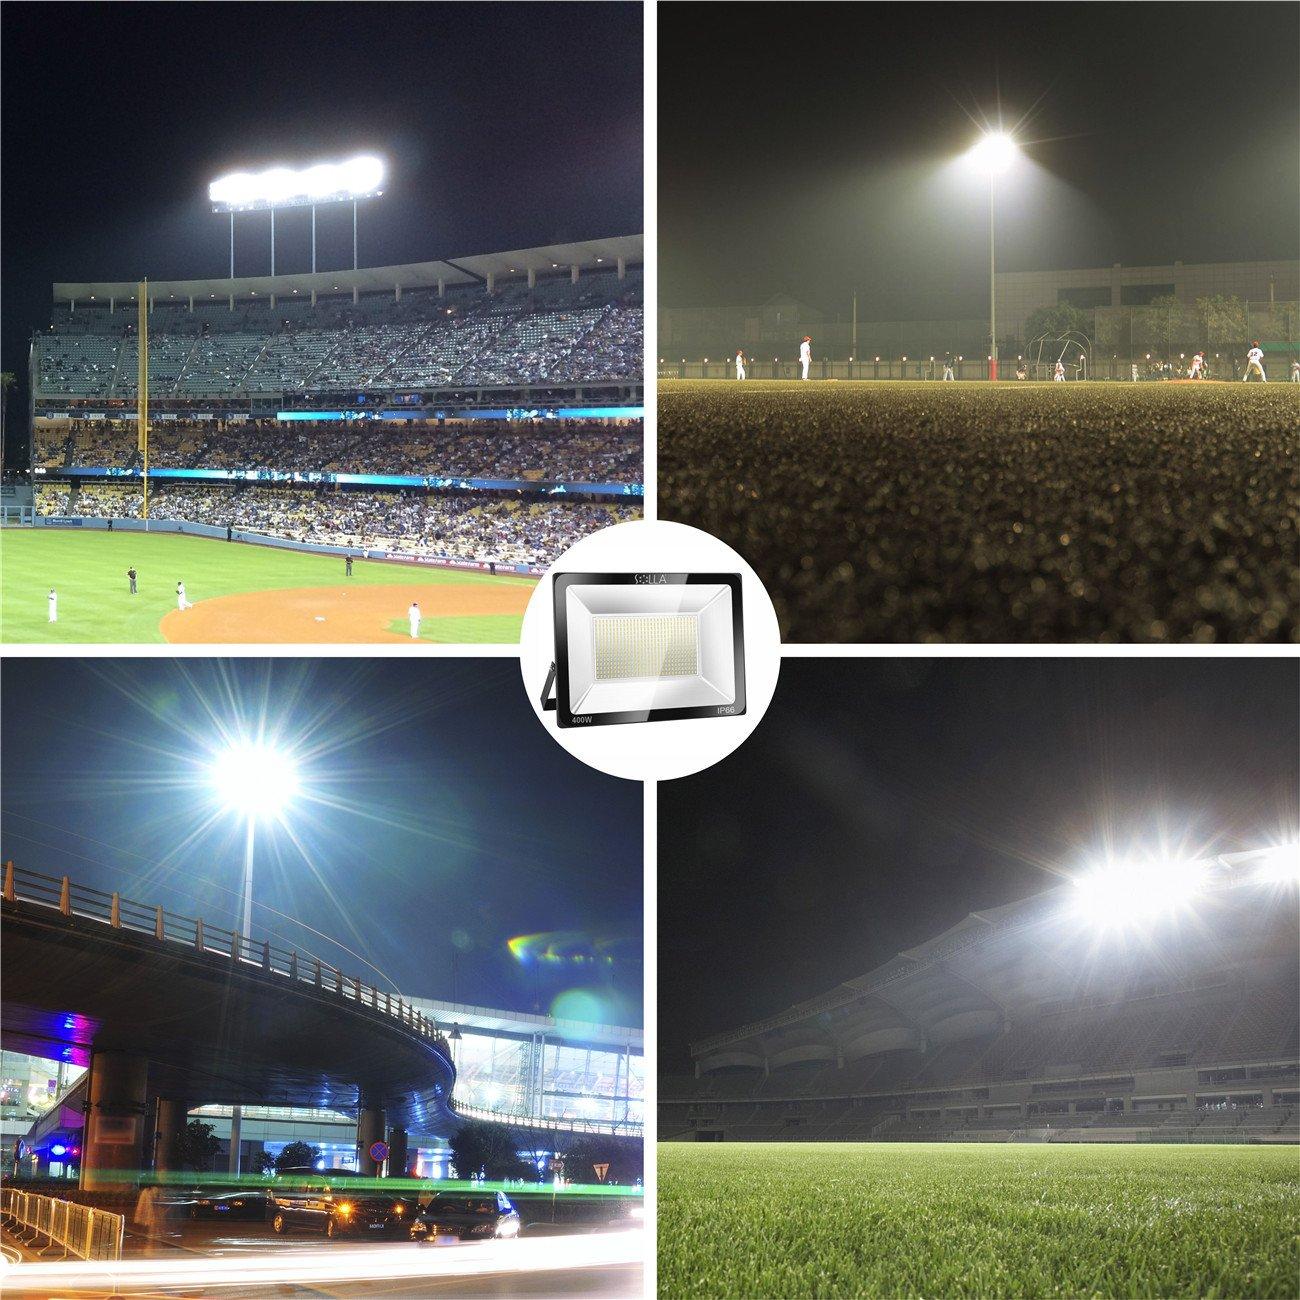 Foco LED 100W IP66 Luz de Seguridad Exterior Impermeable Plazas Almac/én etc. Calles 8000LM Carreteras Jard/ín Blanco C/álido 3000K Garaje Parking Foco Exterior de Pared para Patio